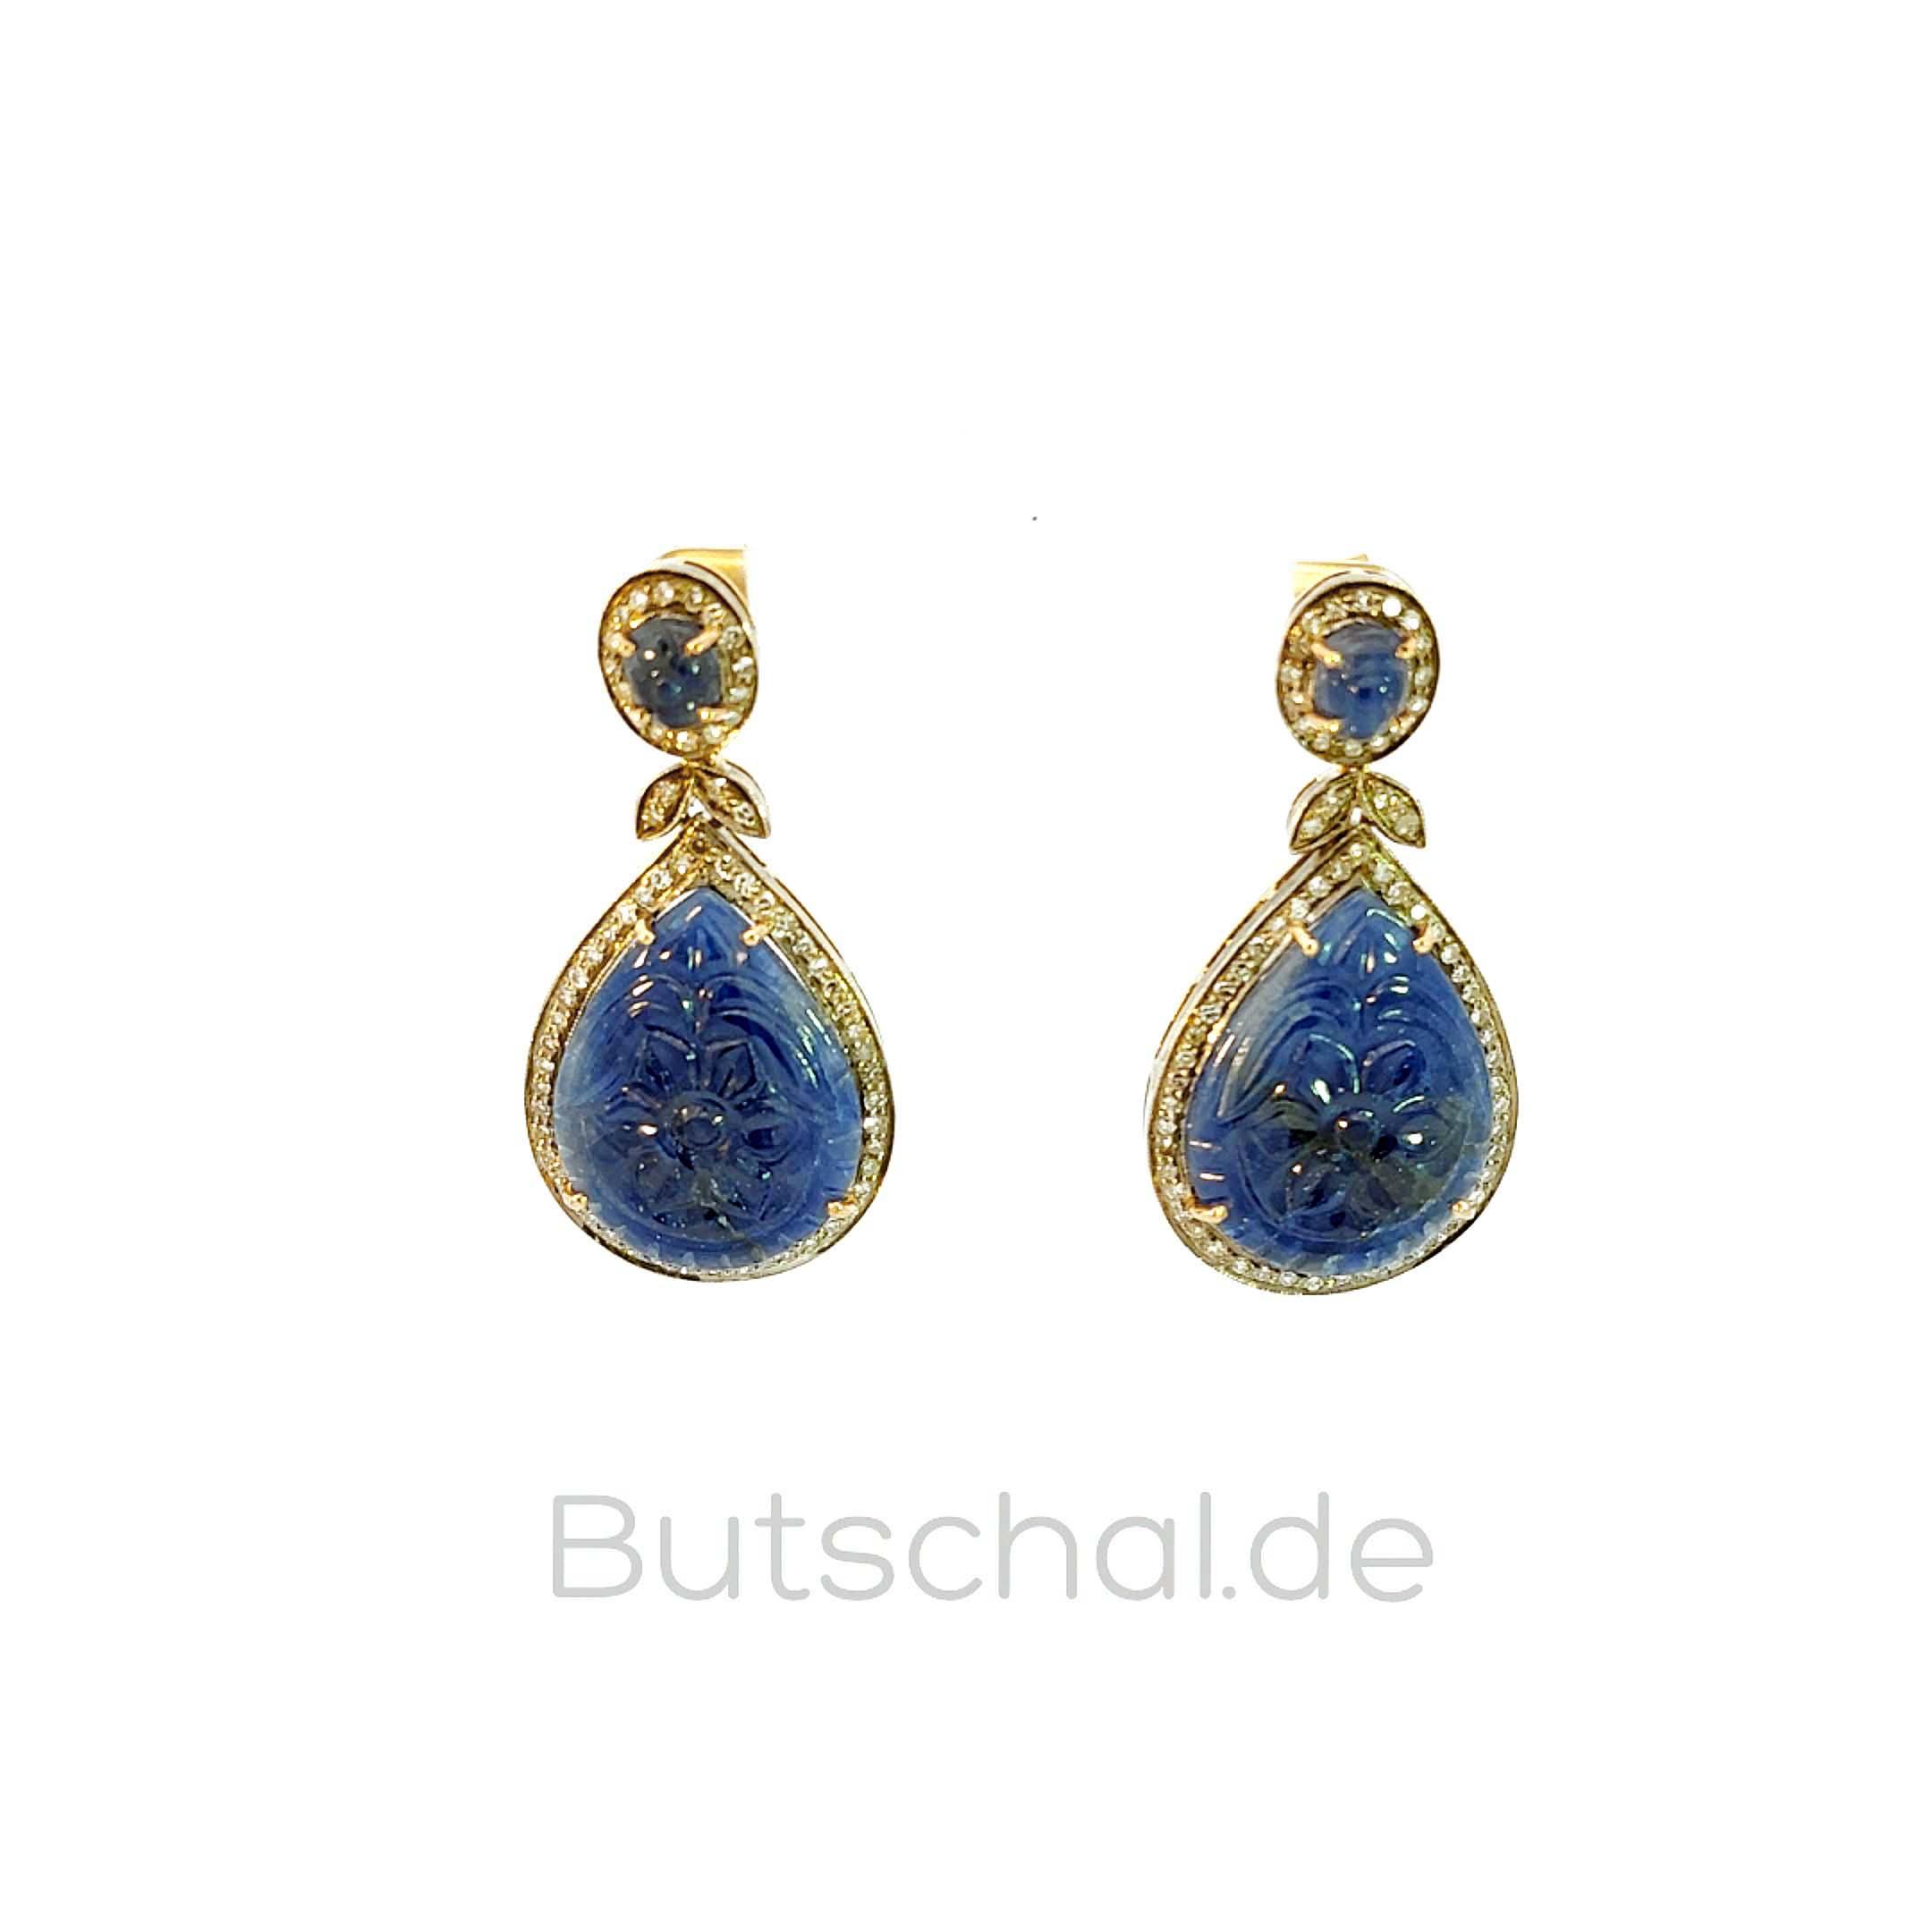 diamant onyx weissgold ohrringe mit 0 1ct diamanten schmuck. Black Bedroom Furniture Sets. Home Design Ideas